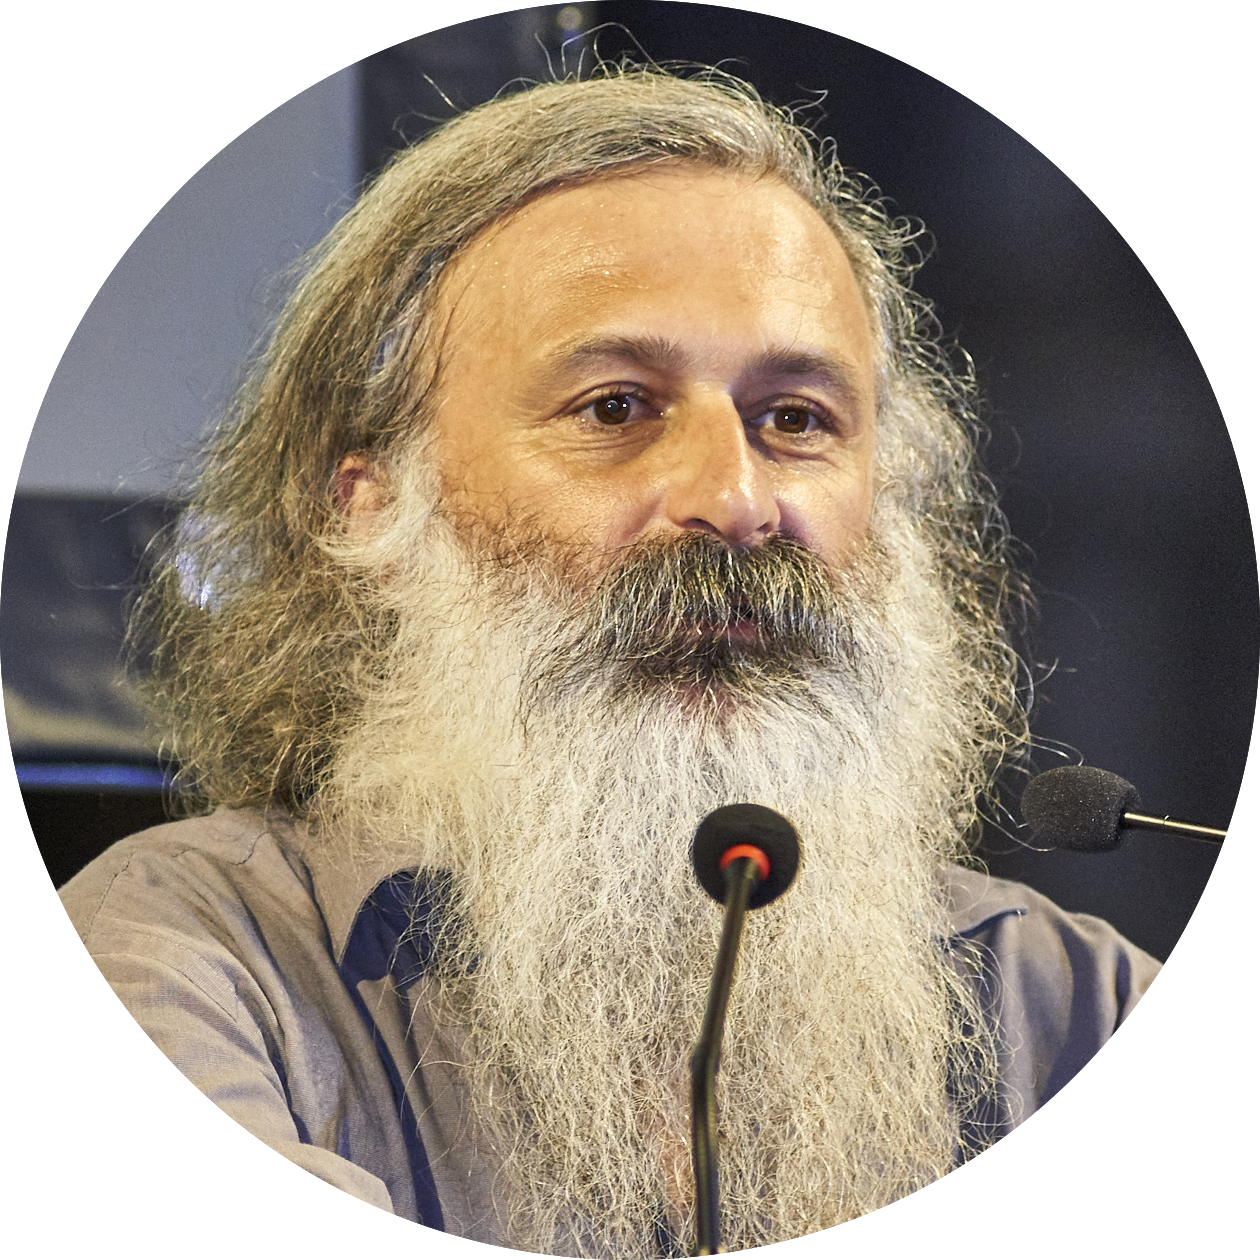 Padre Guidalberto Bormolini